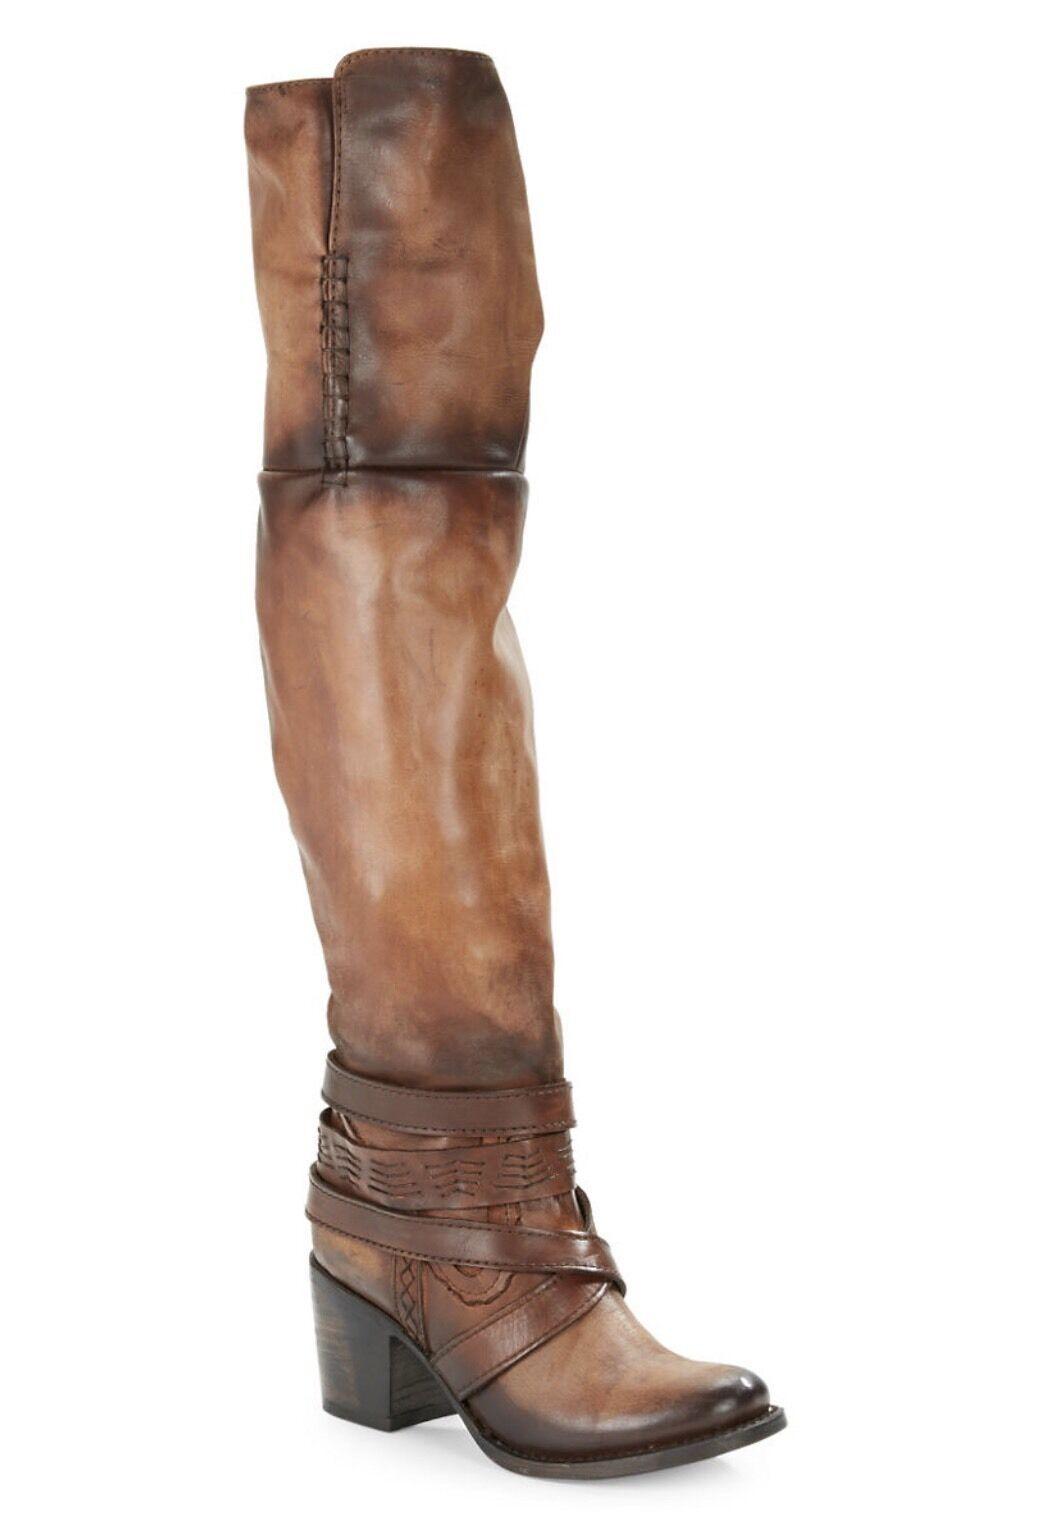 FREEBIRD BY STEVEN RODEO TALL OVER THE KNEE Stiefel WESTERN COGNAC braun BOHO 6